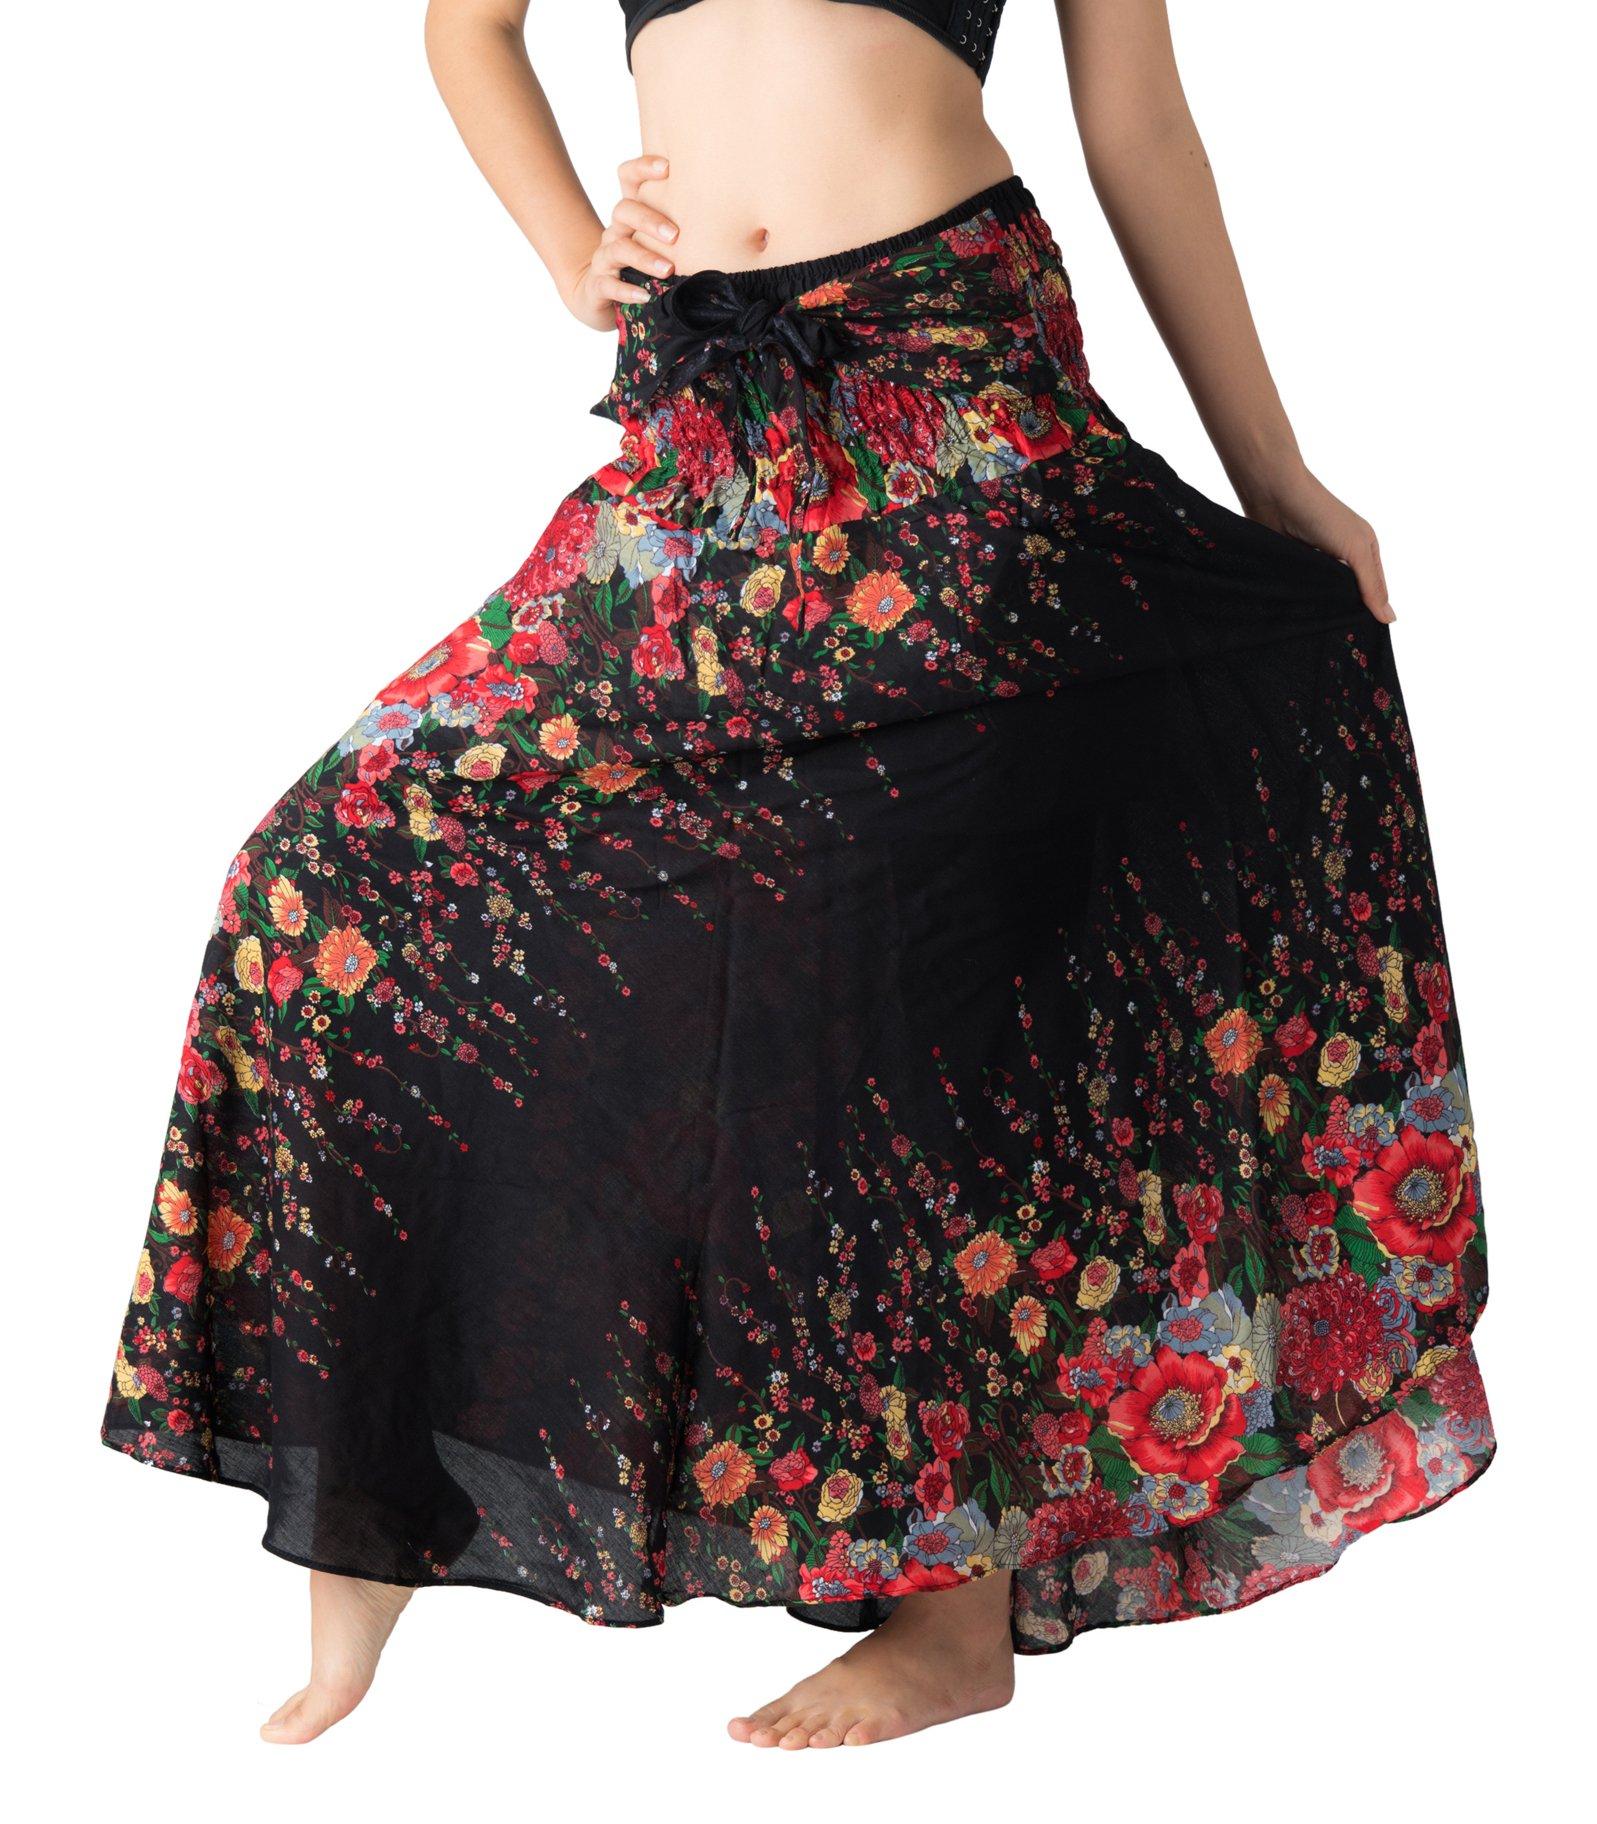 Bangkokpants Women's Long Hippie Bohemian Skirt Gypsy Dress Boho Clothes Flowers One Size Fits (Black Flowers, One Size)